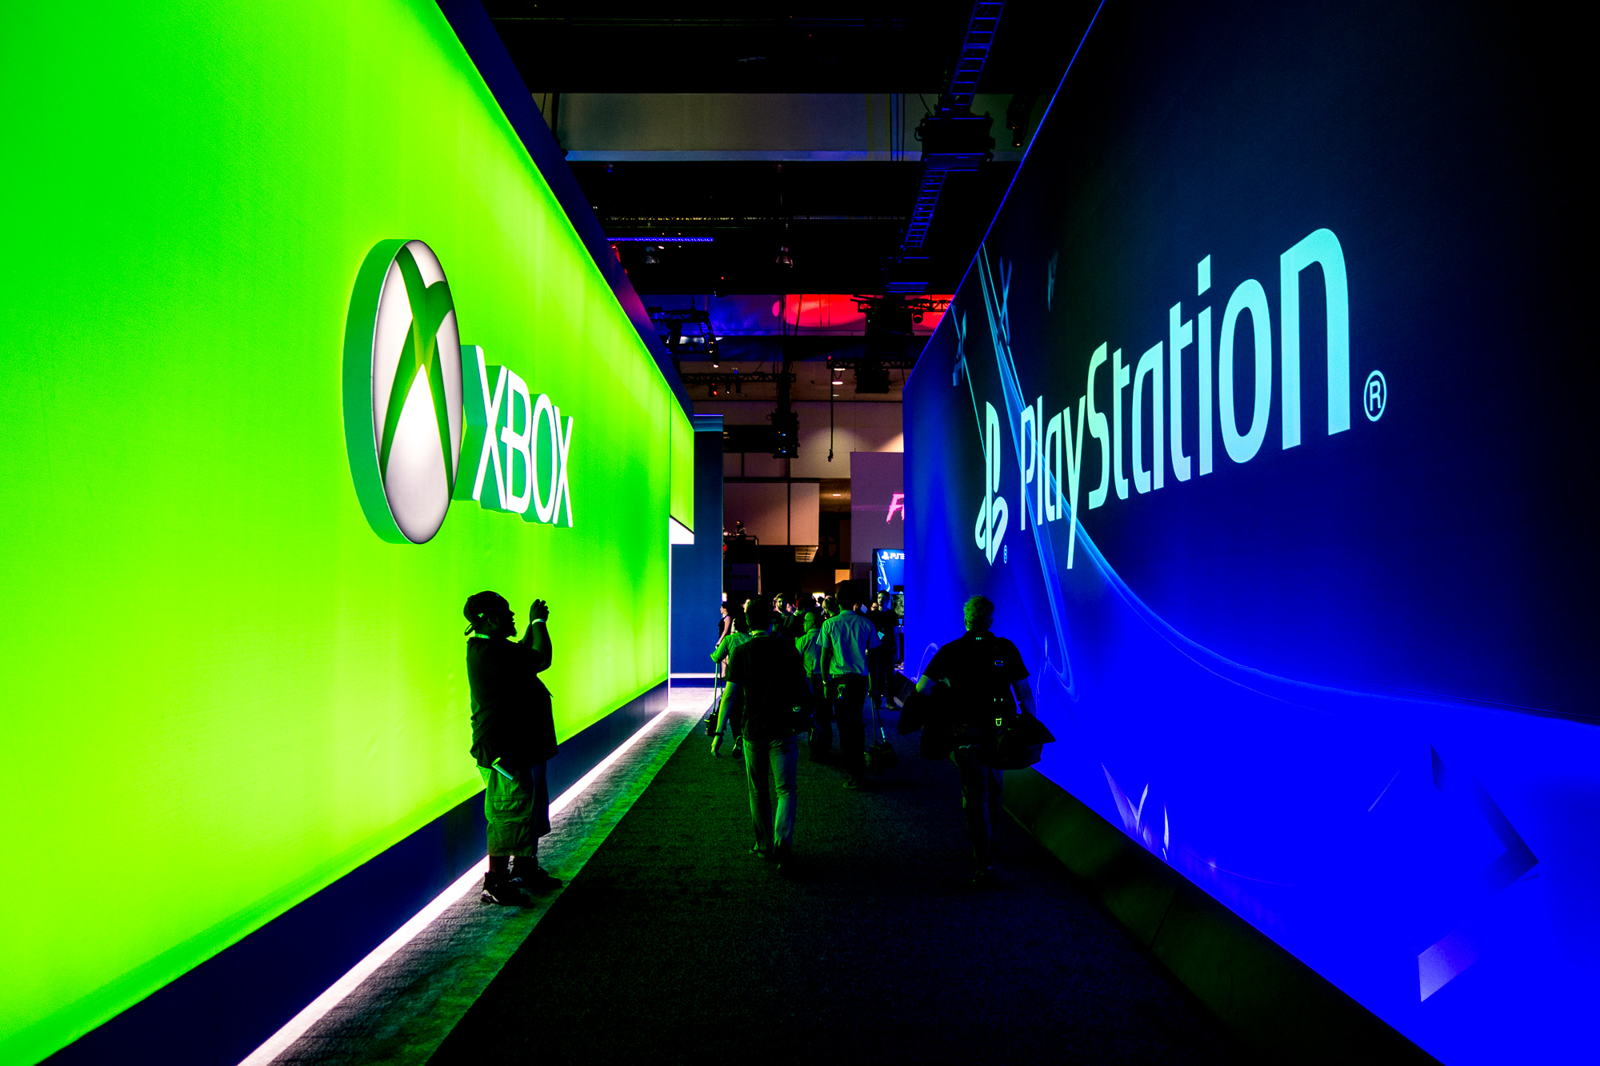 اکسباکس سونی E3 2019 پلیاستیشن مایکروسافت